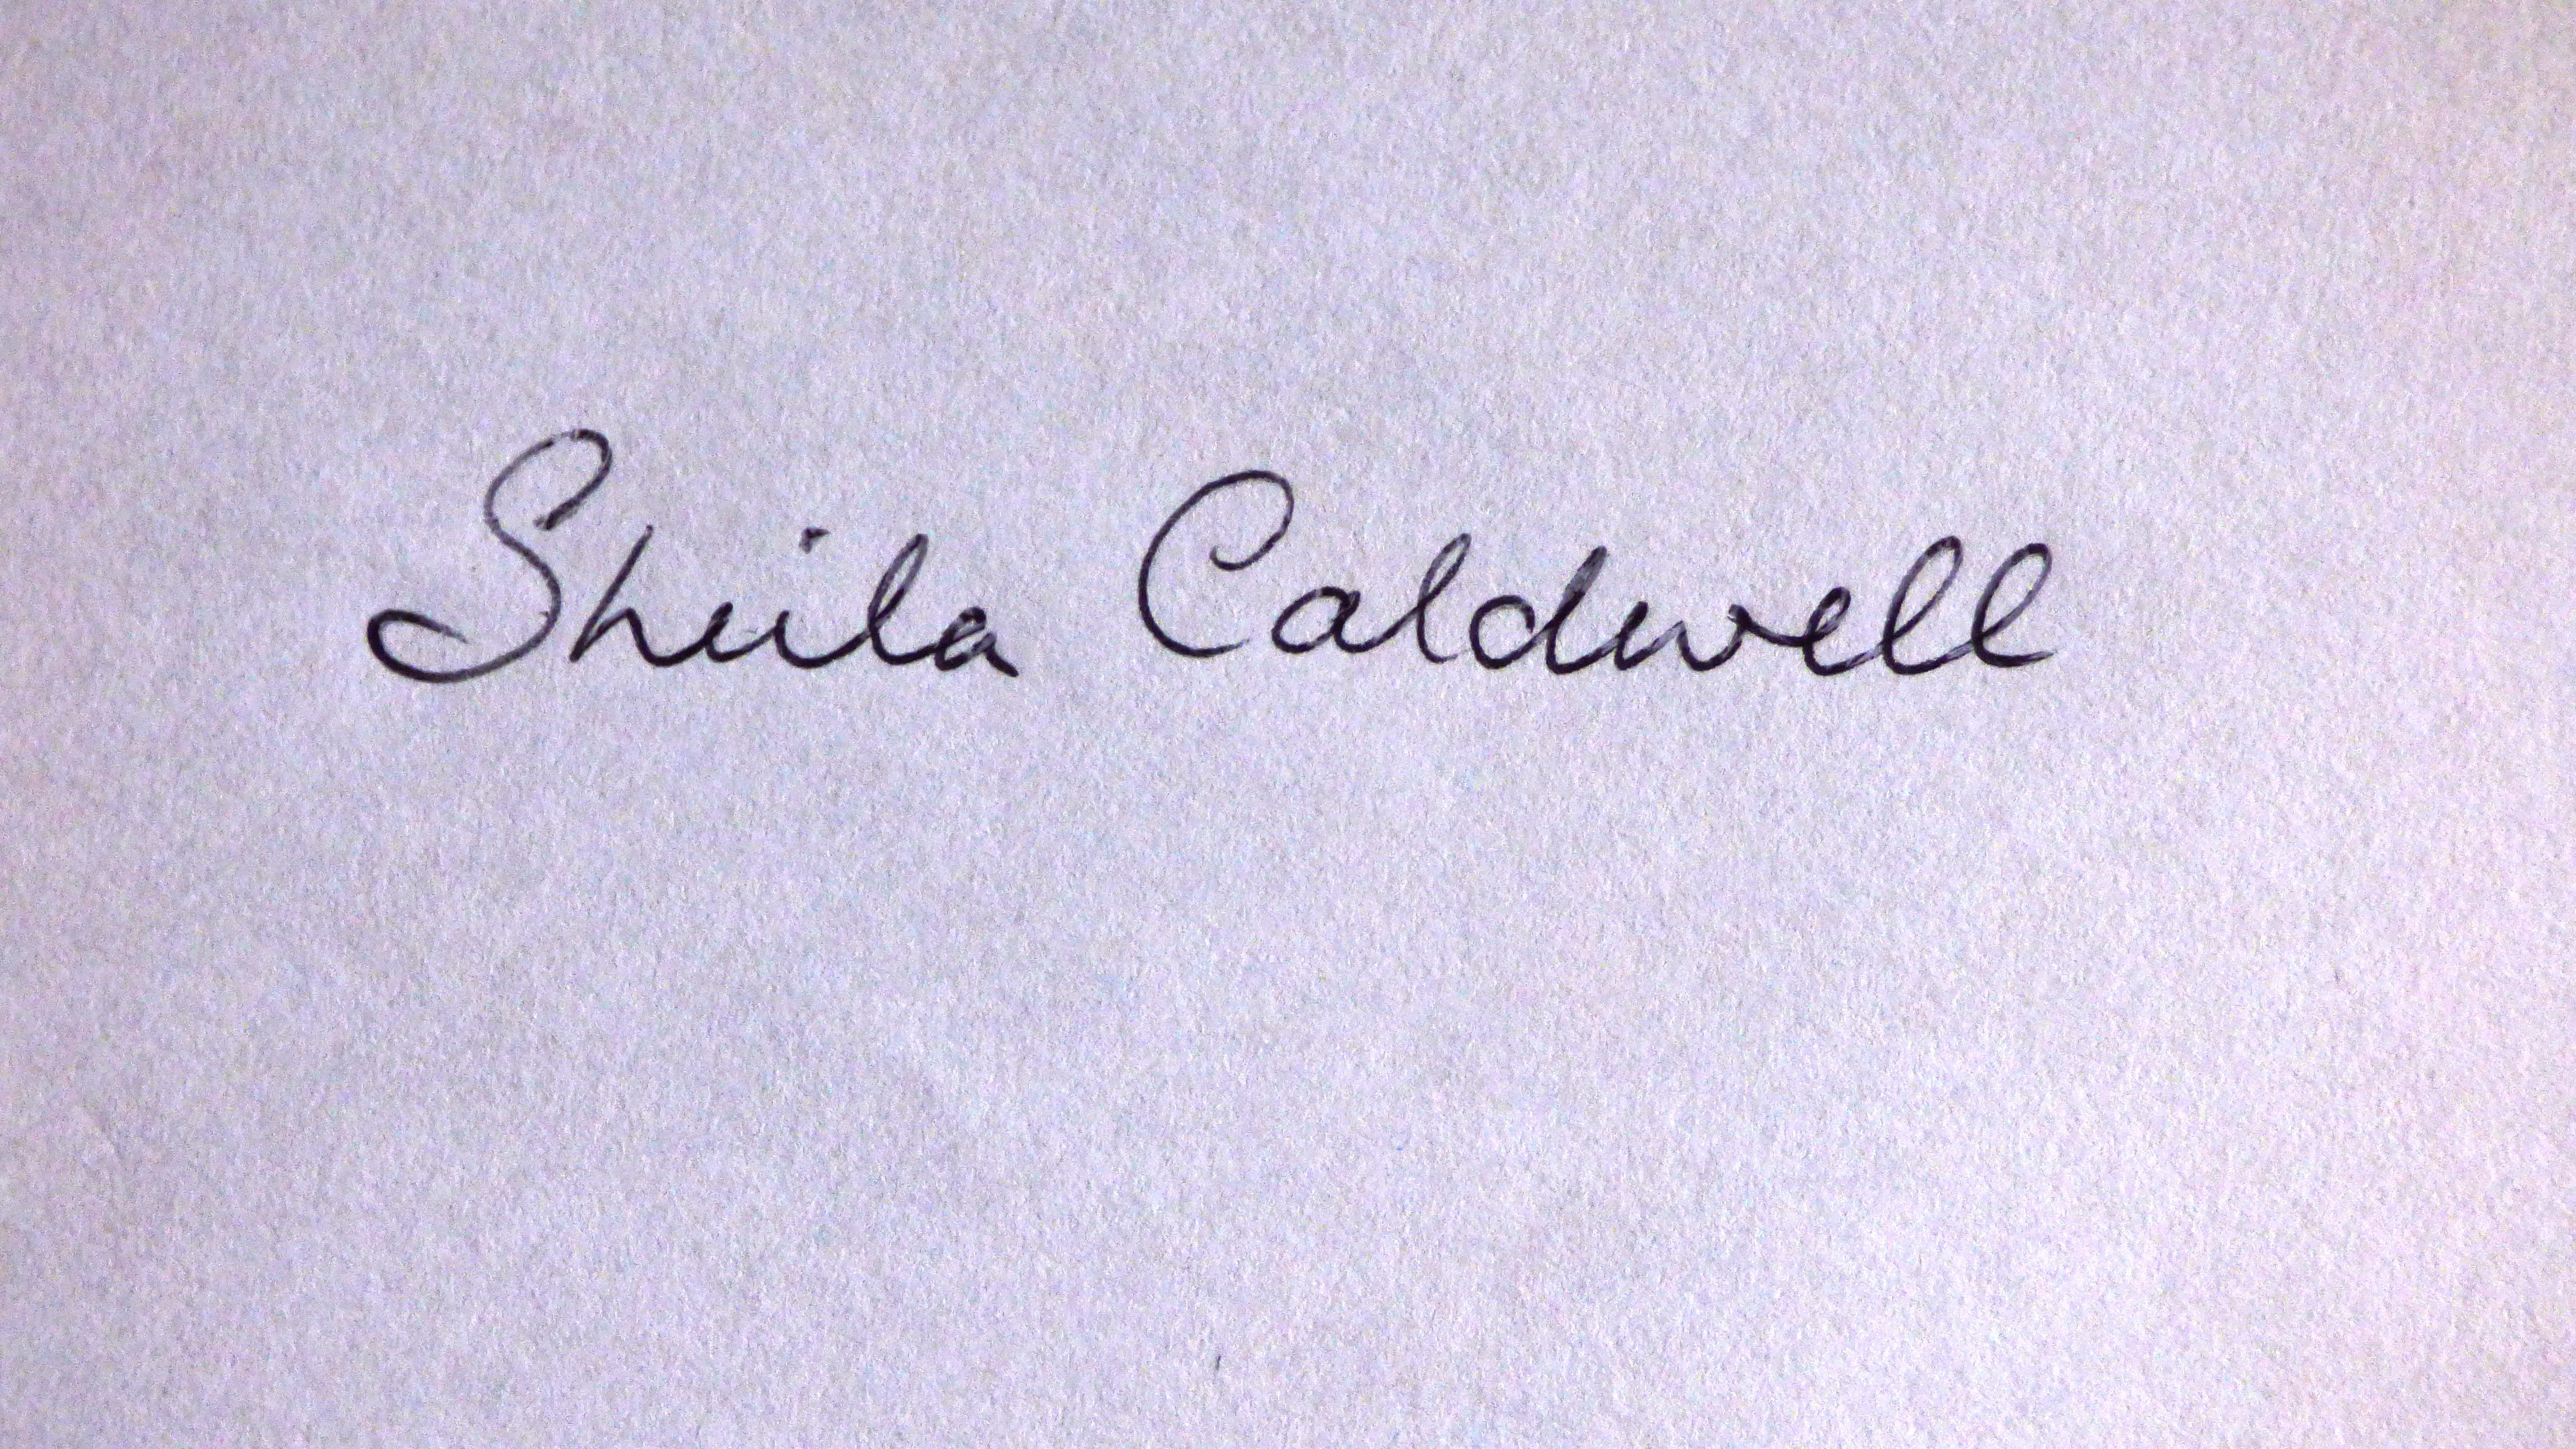 Sheila Caldwell's Signature